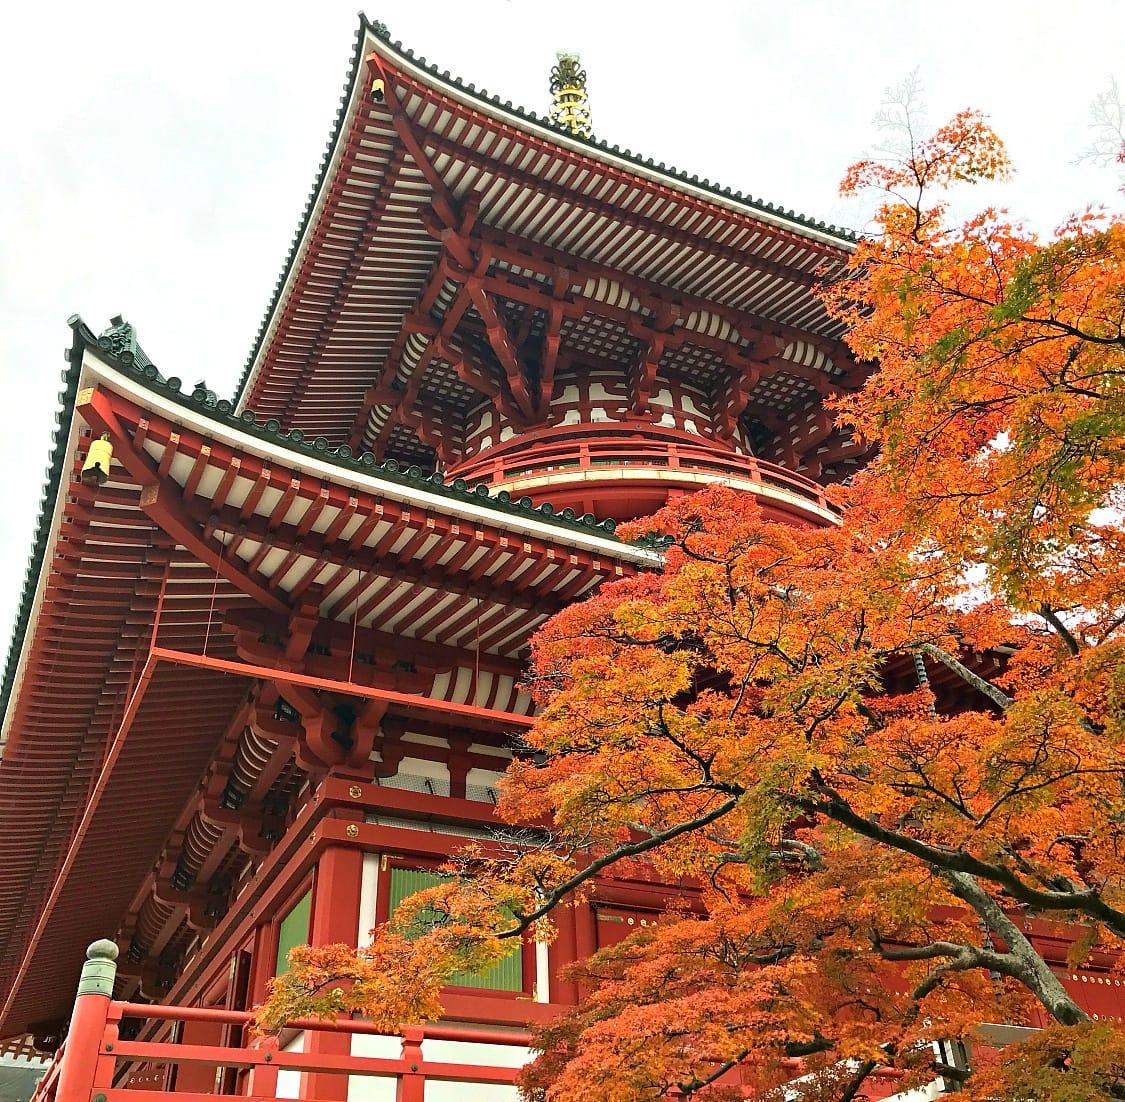 Naritasan Shinshoji Temple in Narita, Japan ~ Things to do in Narita, Japan